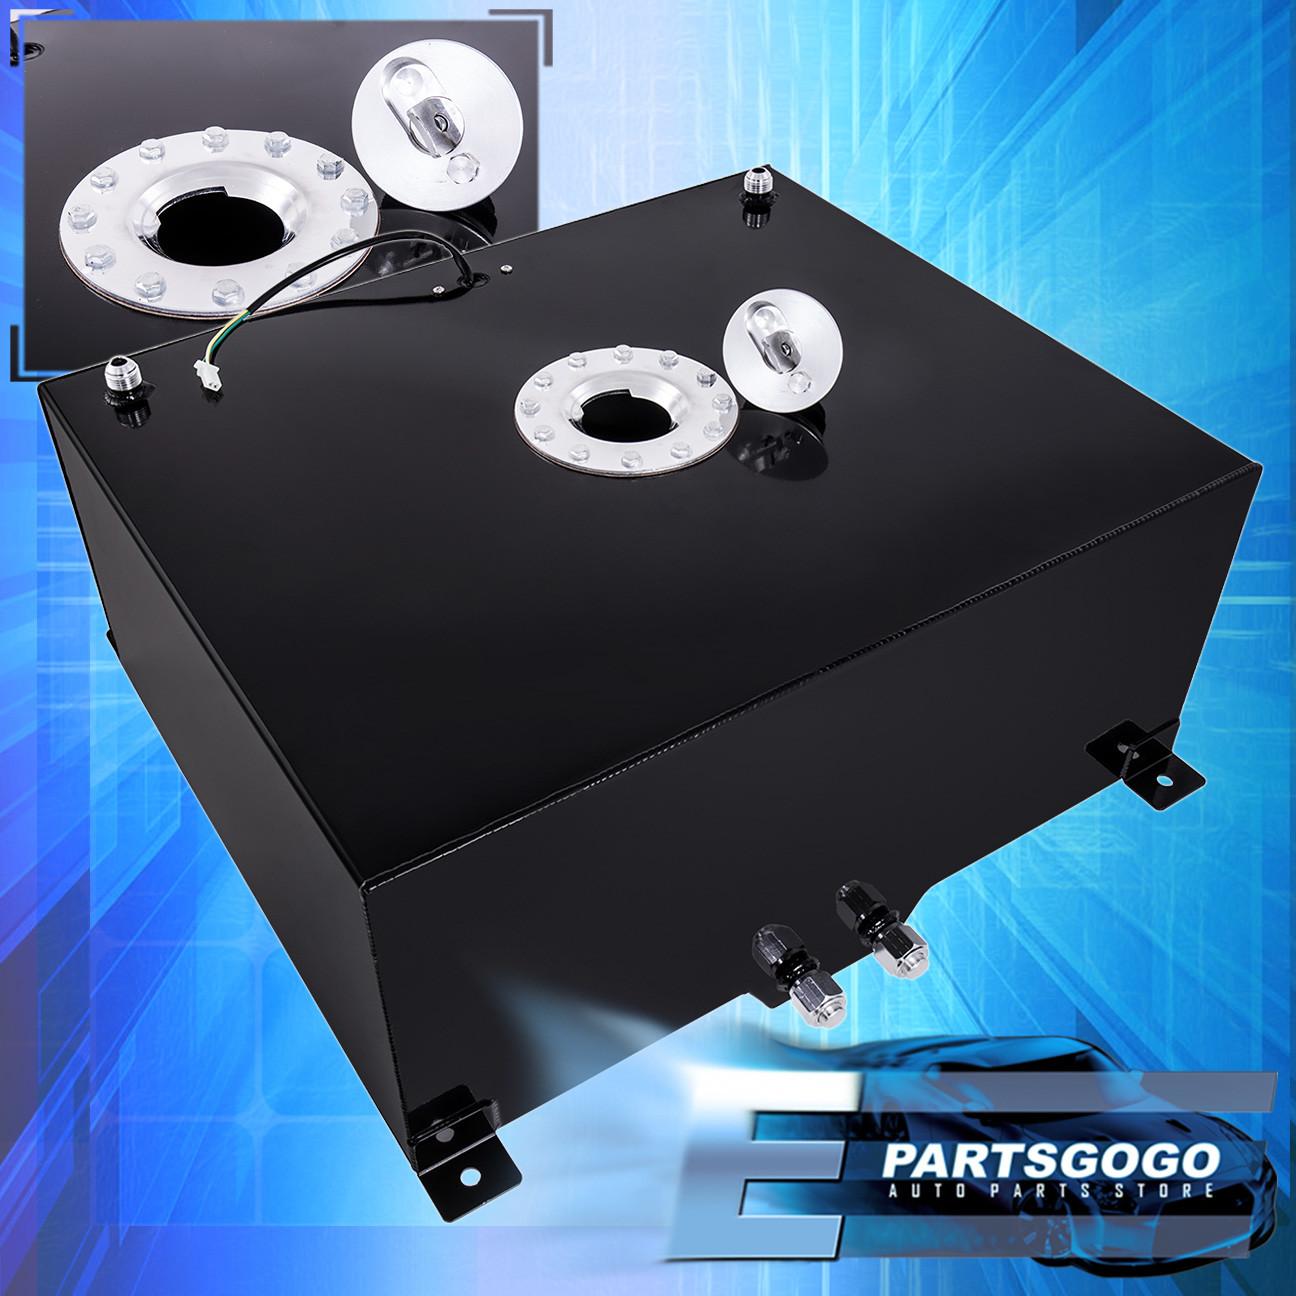 Details about 21 Gallon / 80 Liter Black Aluminum Chrome Cap Fuel Cell Tank  With Gauge Sender